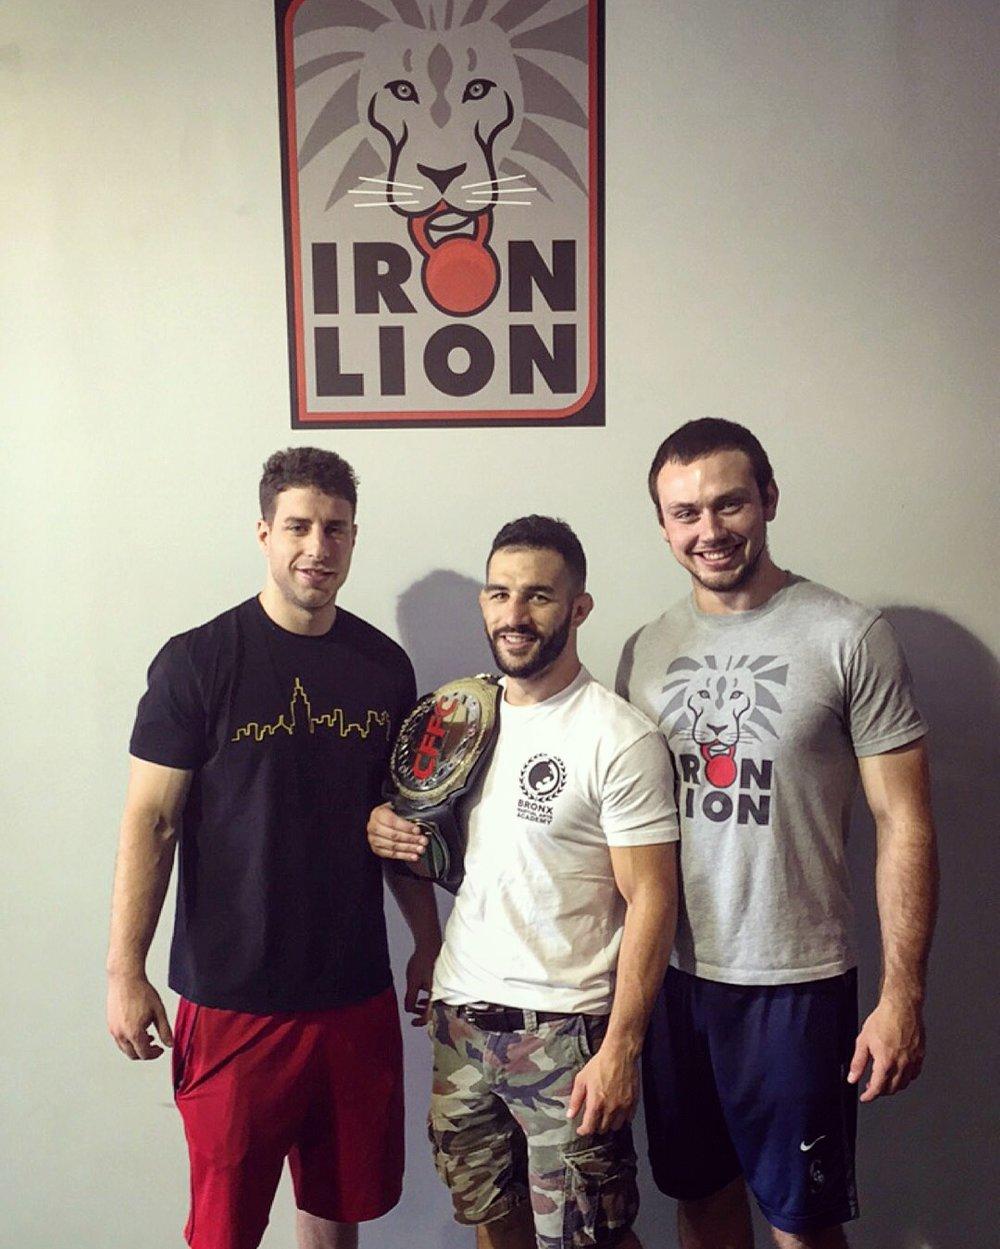 iron lion with champ.JPG